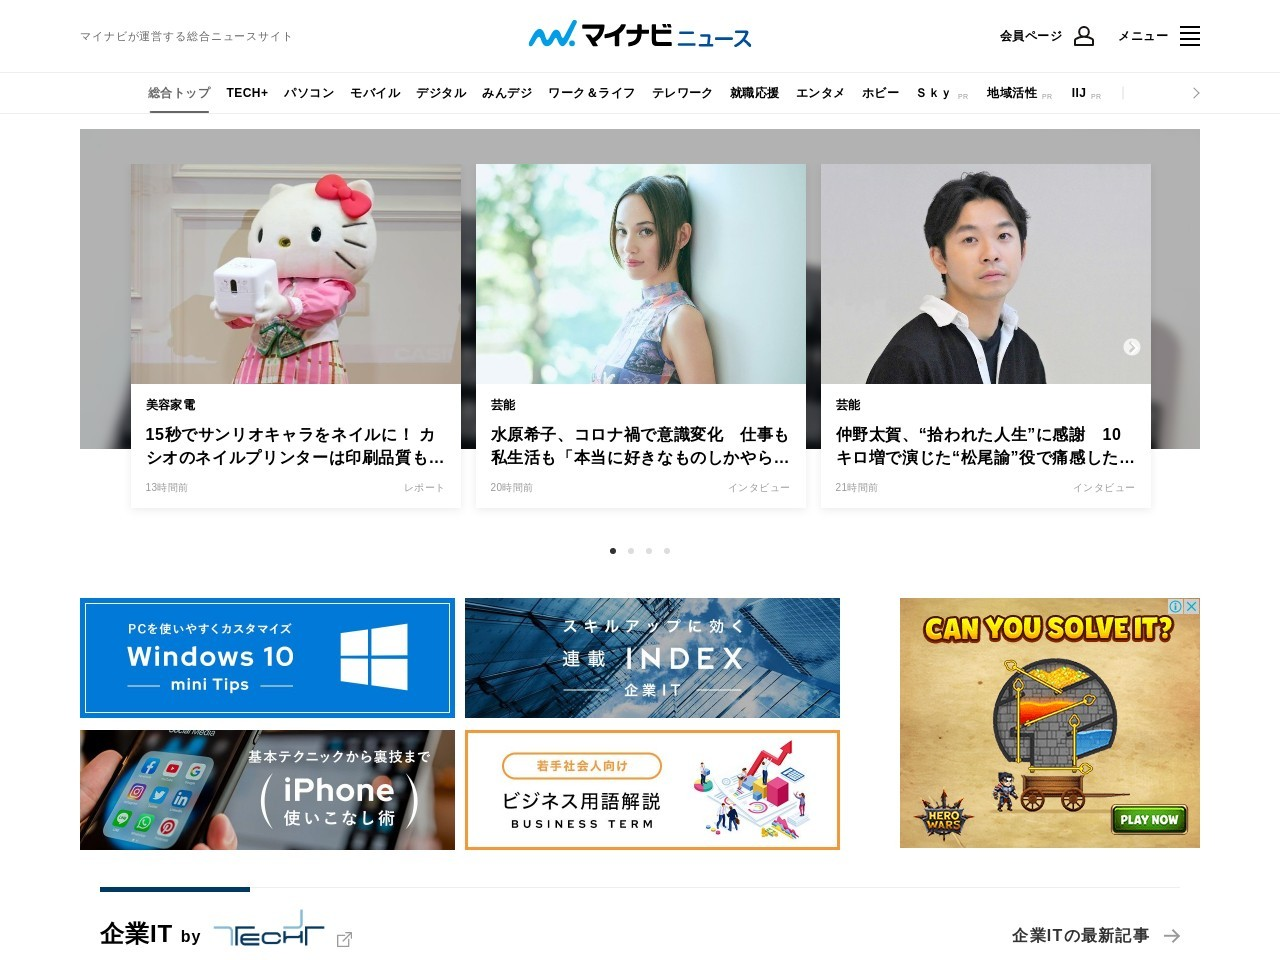 http://news.mynavi.jp/news/2014/07/25/369/